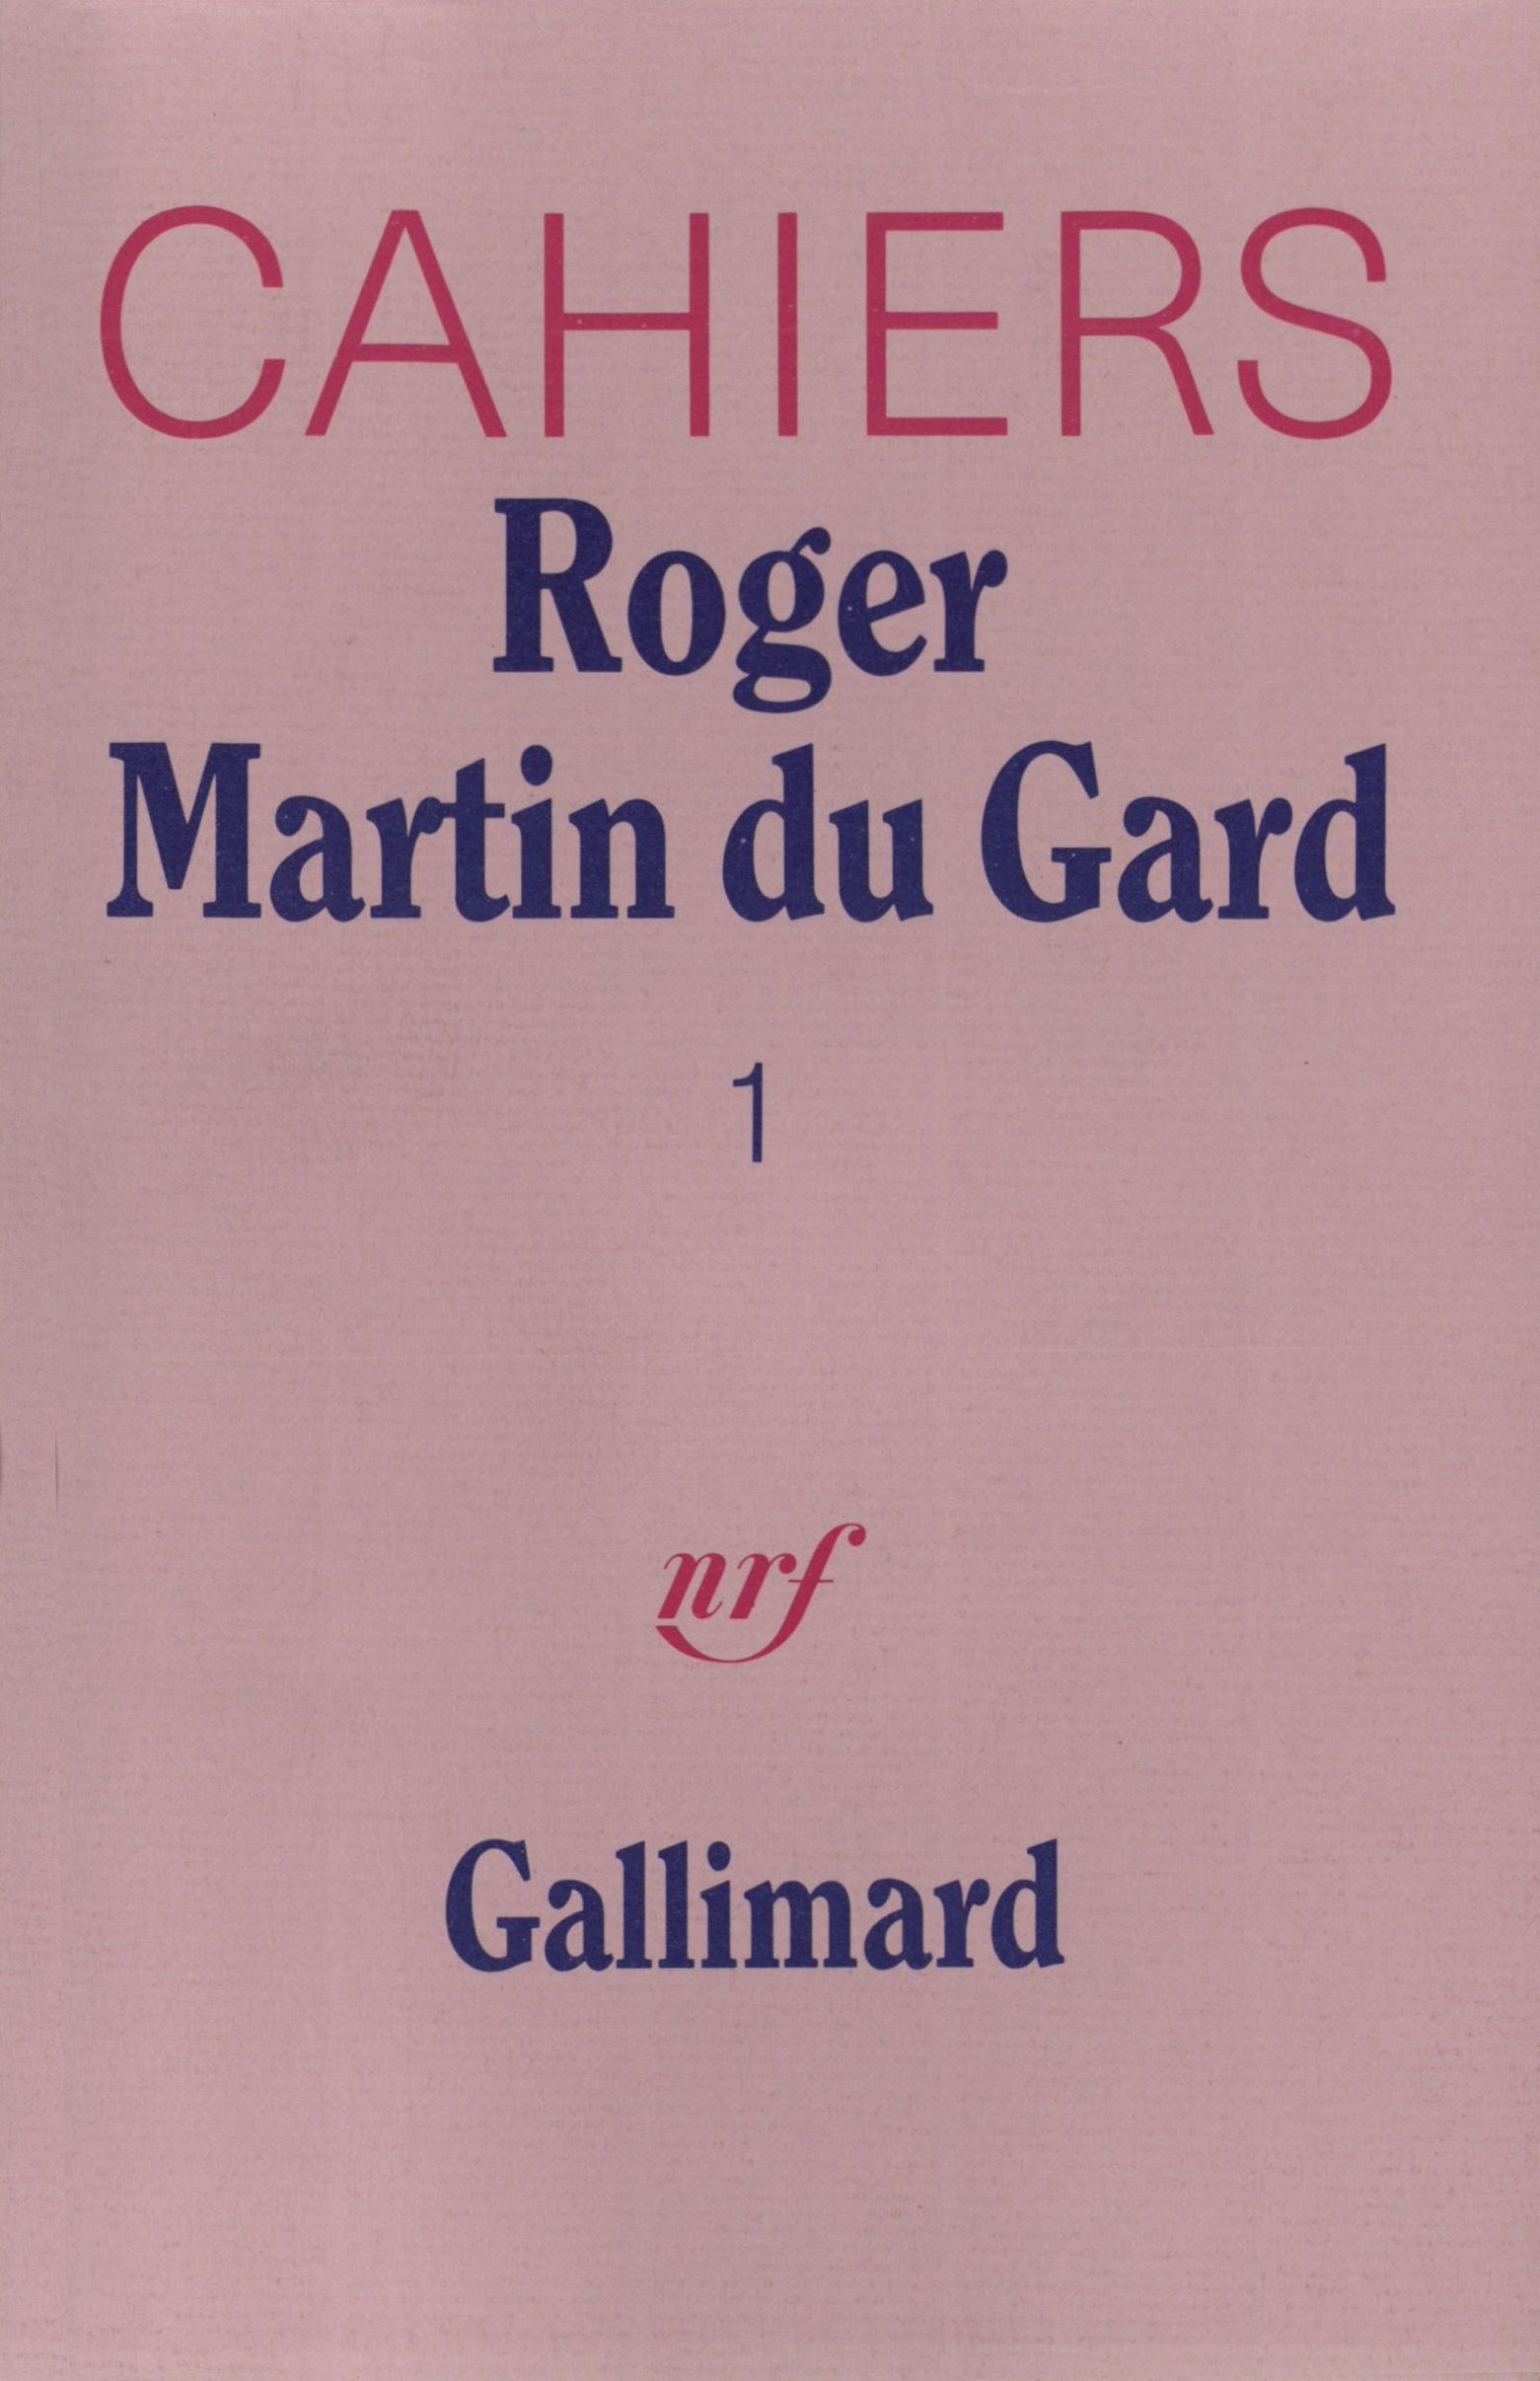 Cahiers Roger Martin du Gard